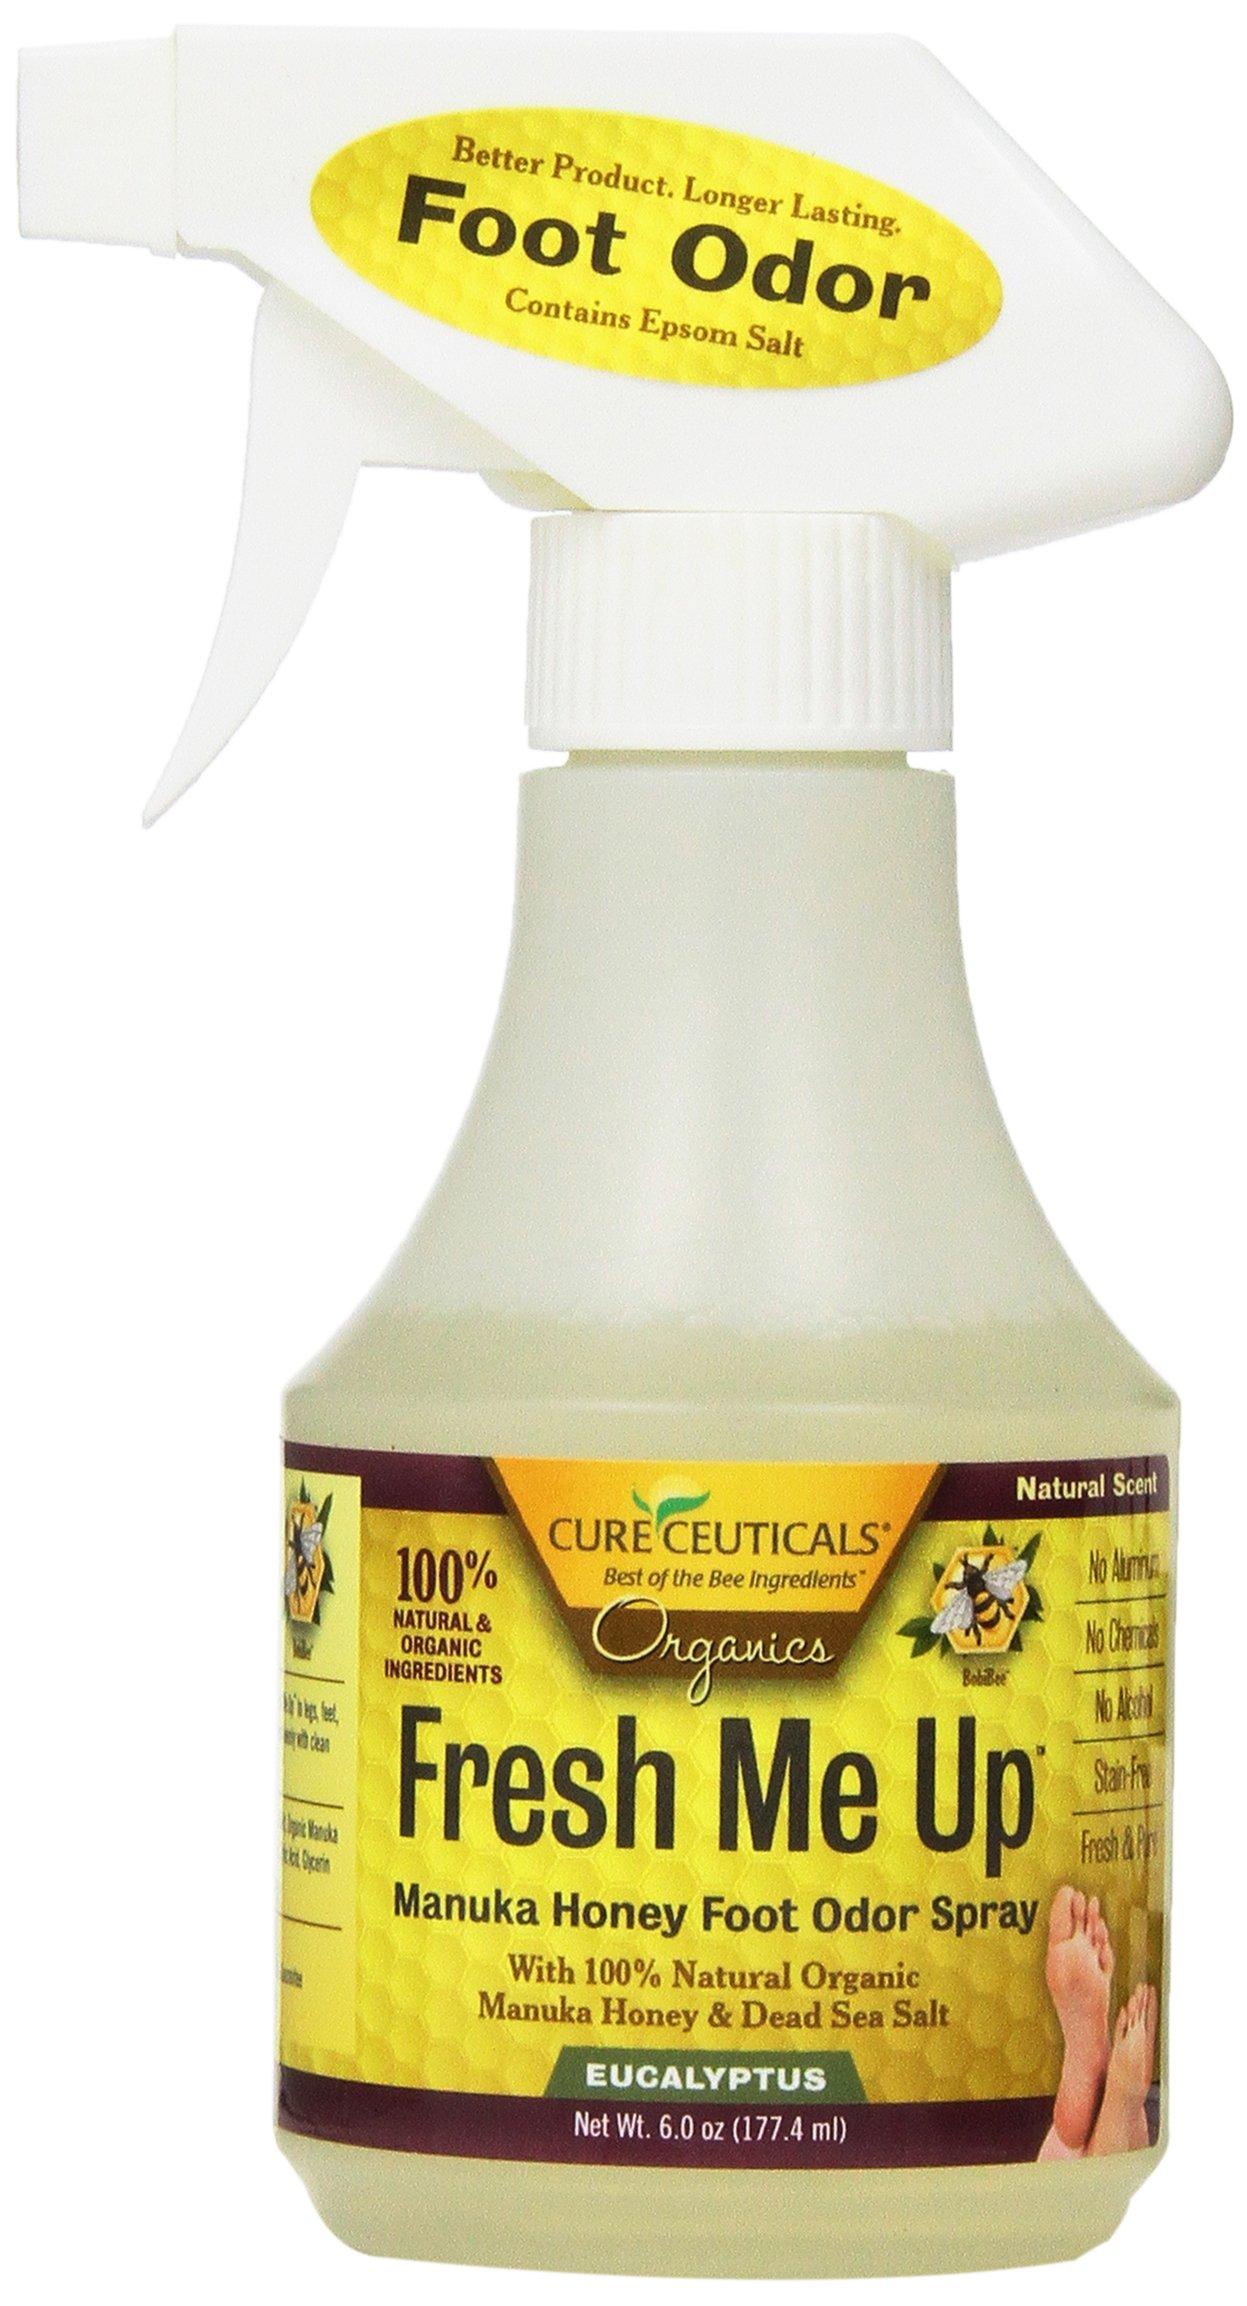 Cureceuticals Fresh Me Up Manuka Honey Foot Odor Spray - Eucalyptus, 6-Ounce